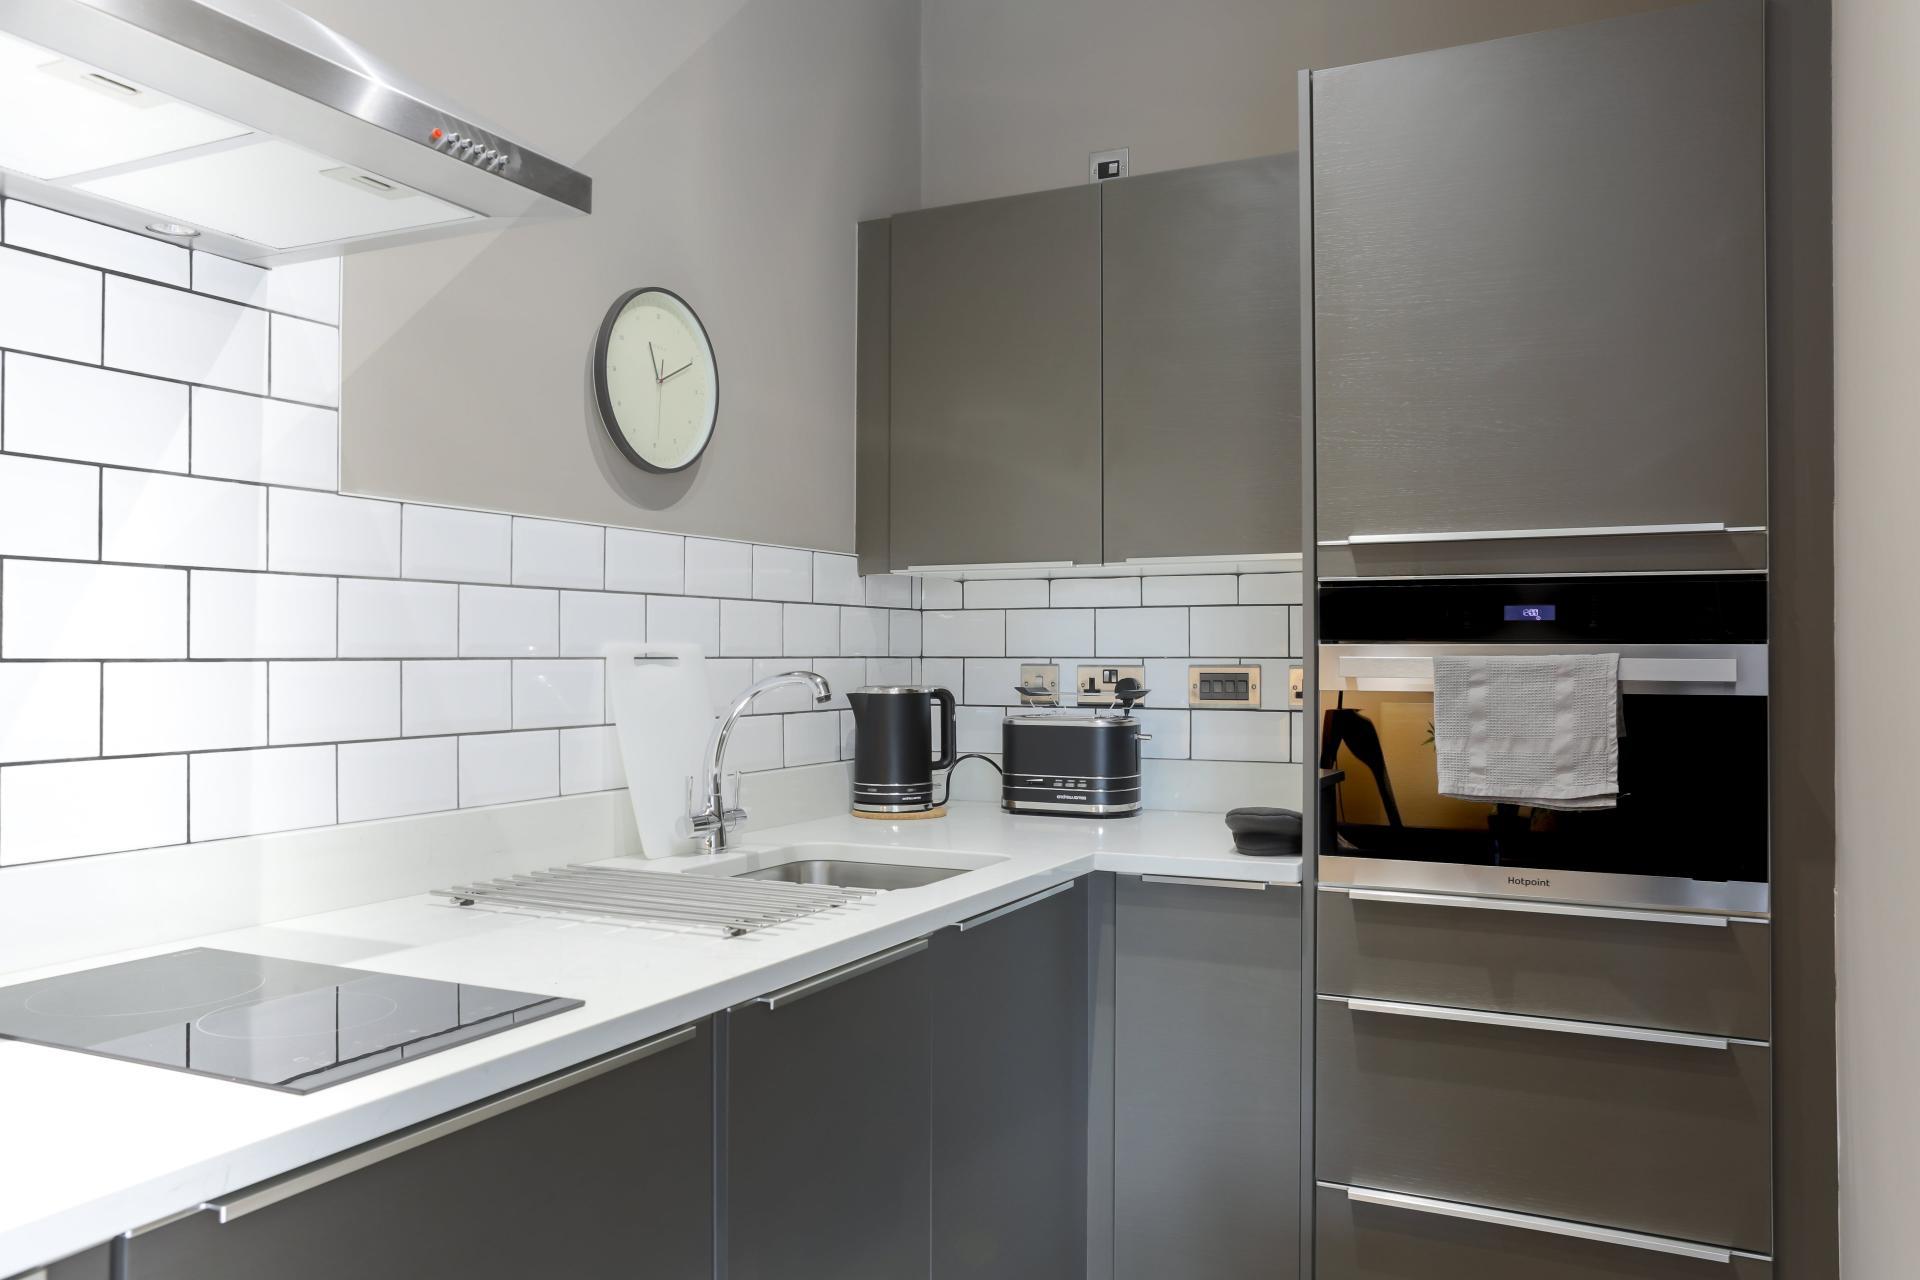 Kitchen at Park Lane Aparthotel, Centre, Cardiff - Citybase Apartments